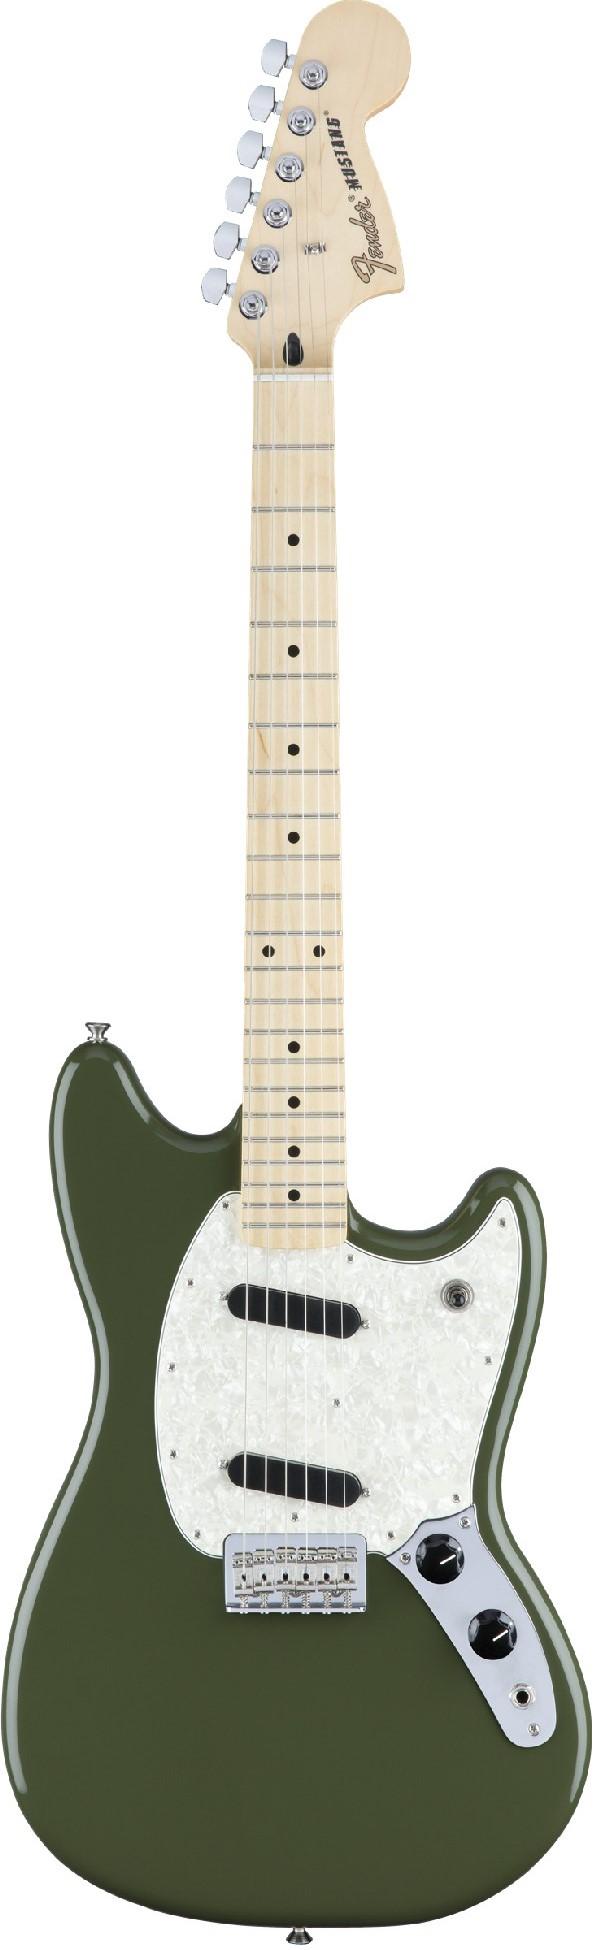 Электрогитара Fender Mustang MN Olive